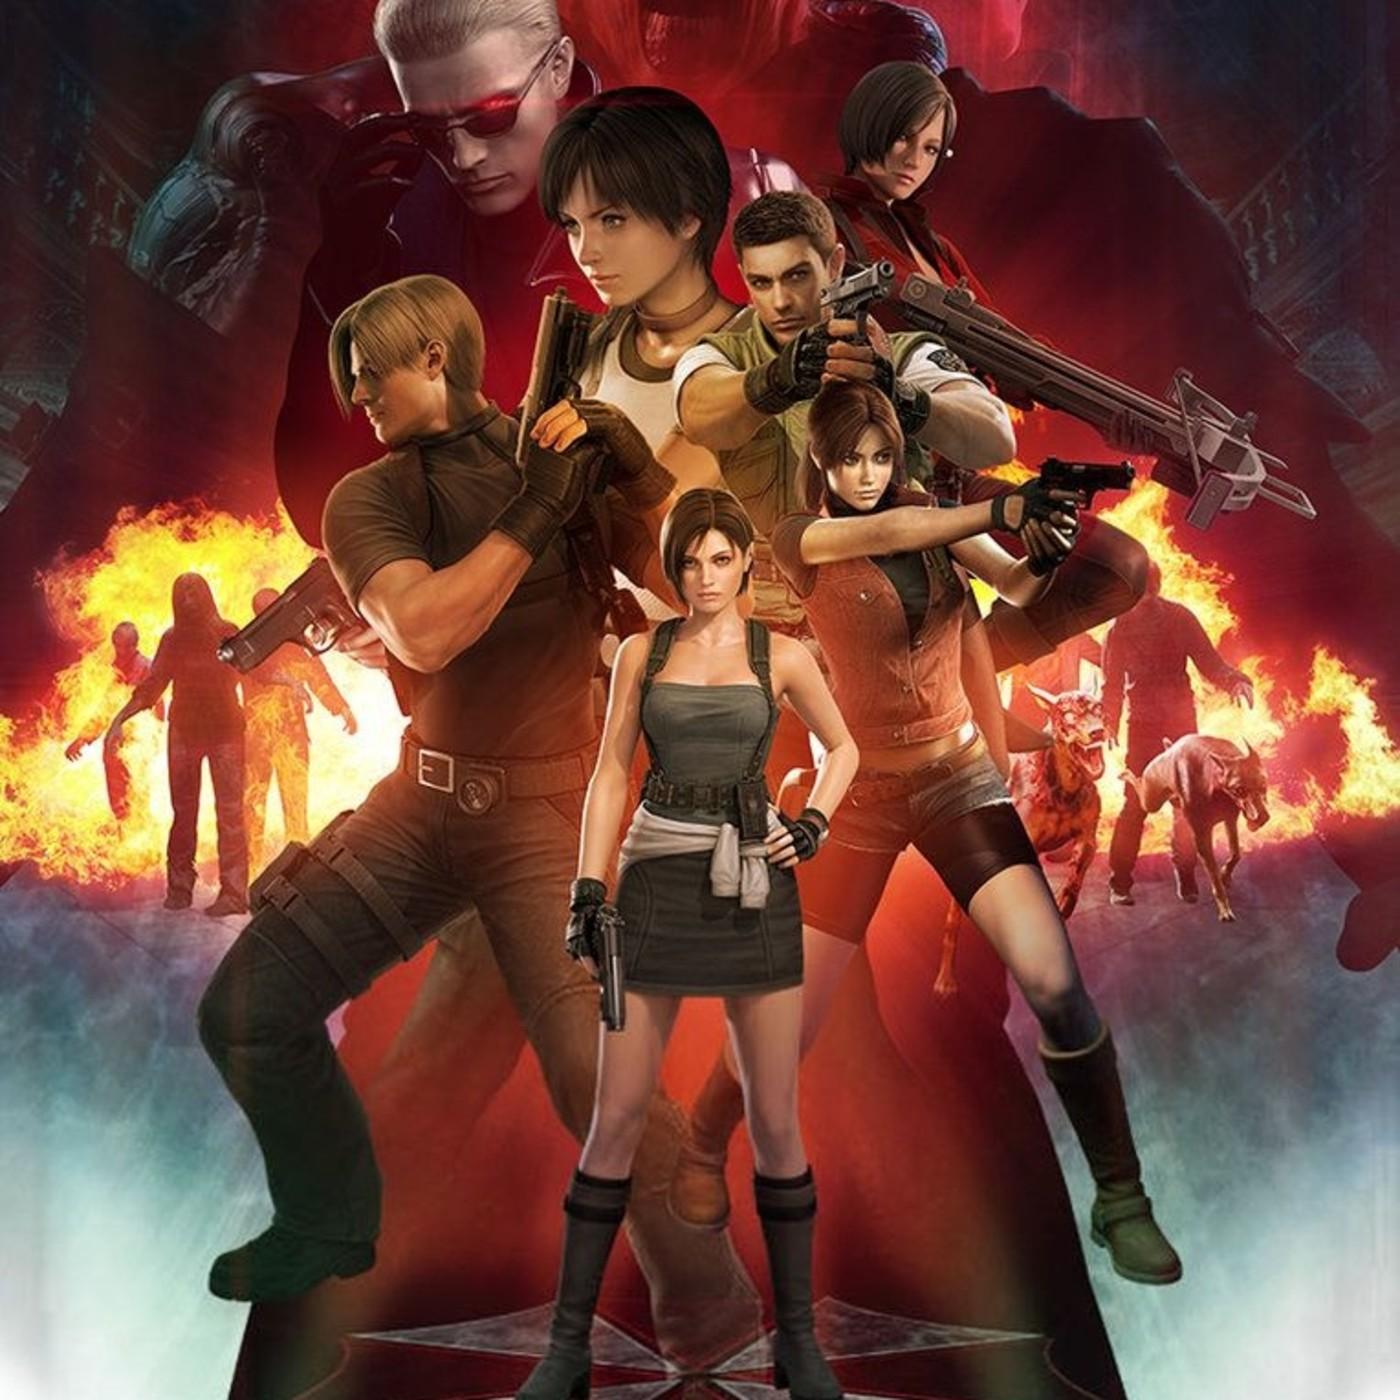 Soulmers Fresh! Recomendando Resident Evil